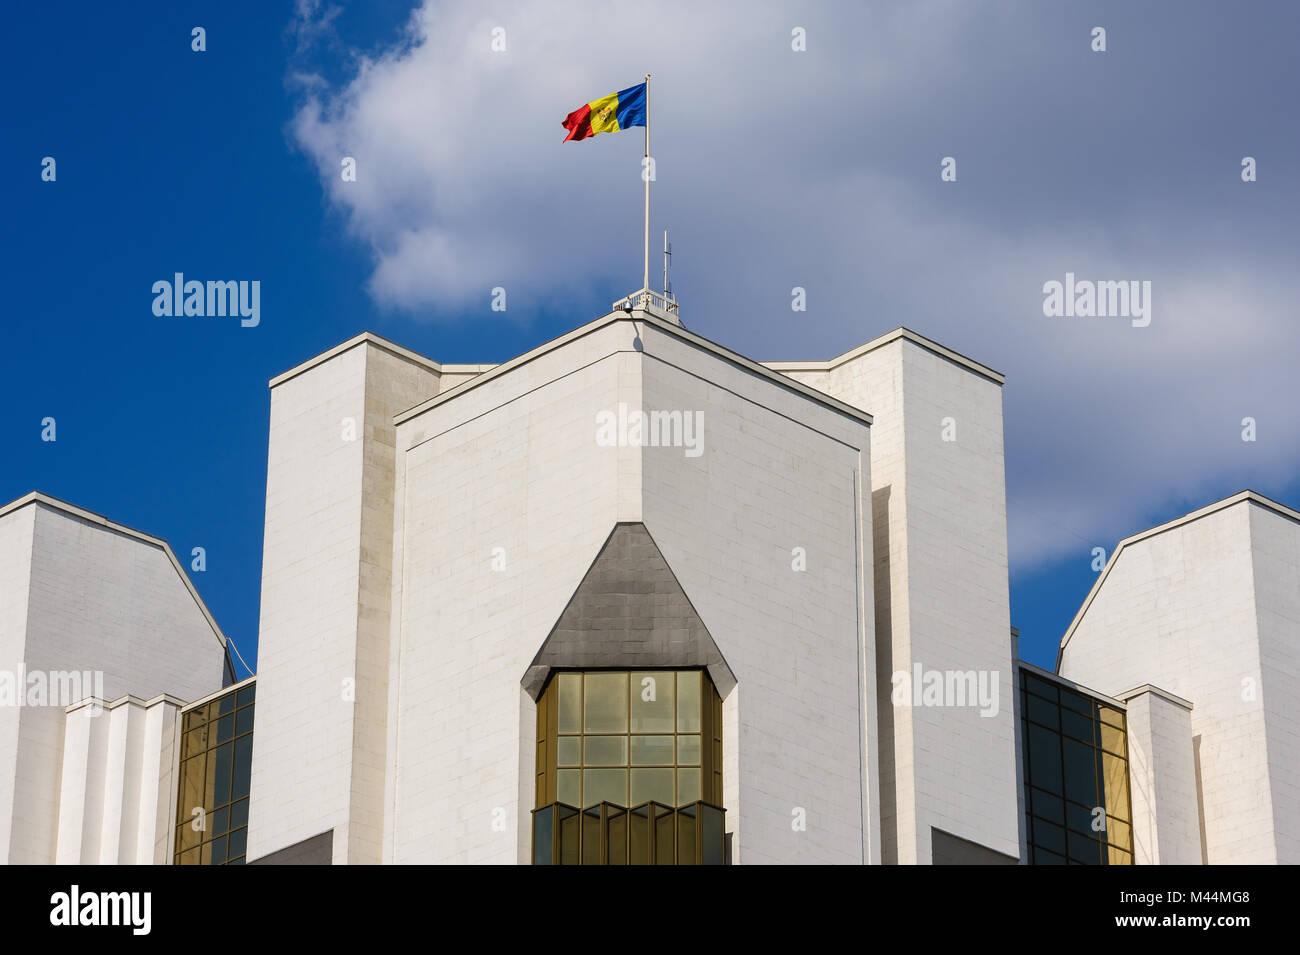 President's administration building, Chisinau, Moldova - Stock Image